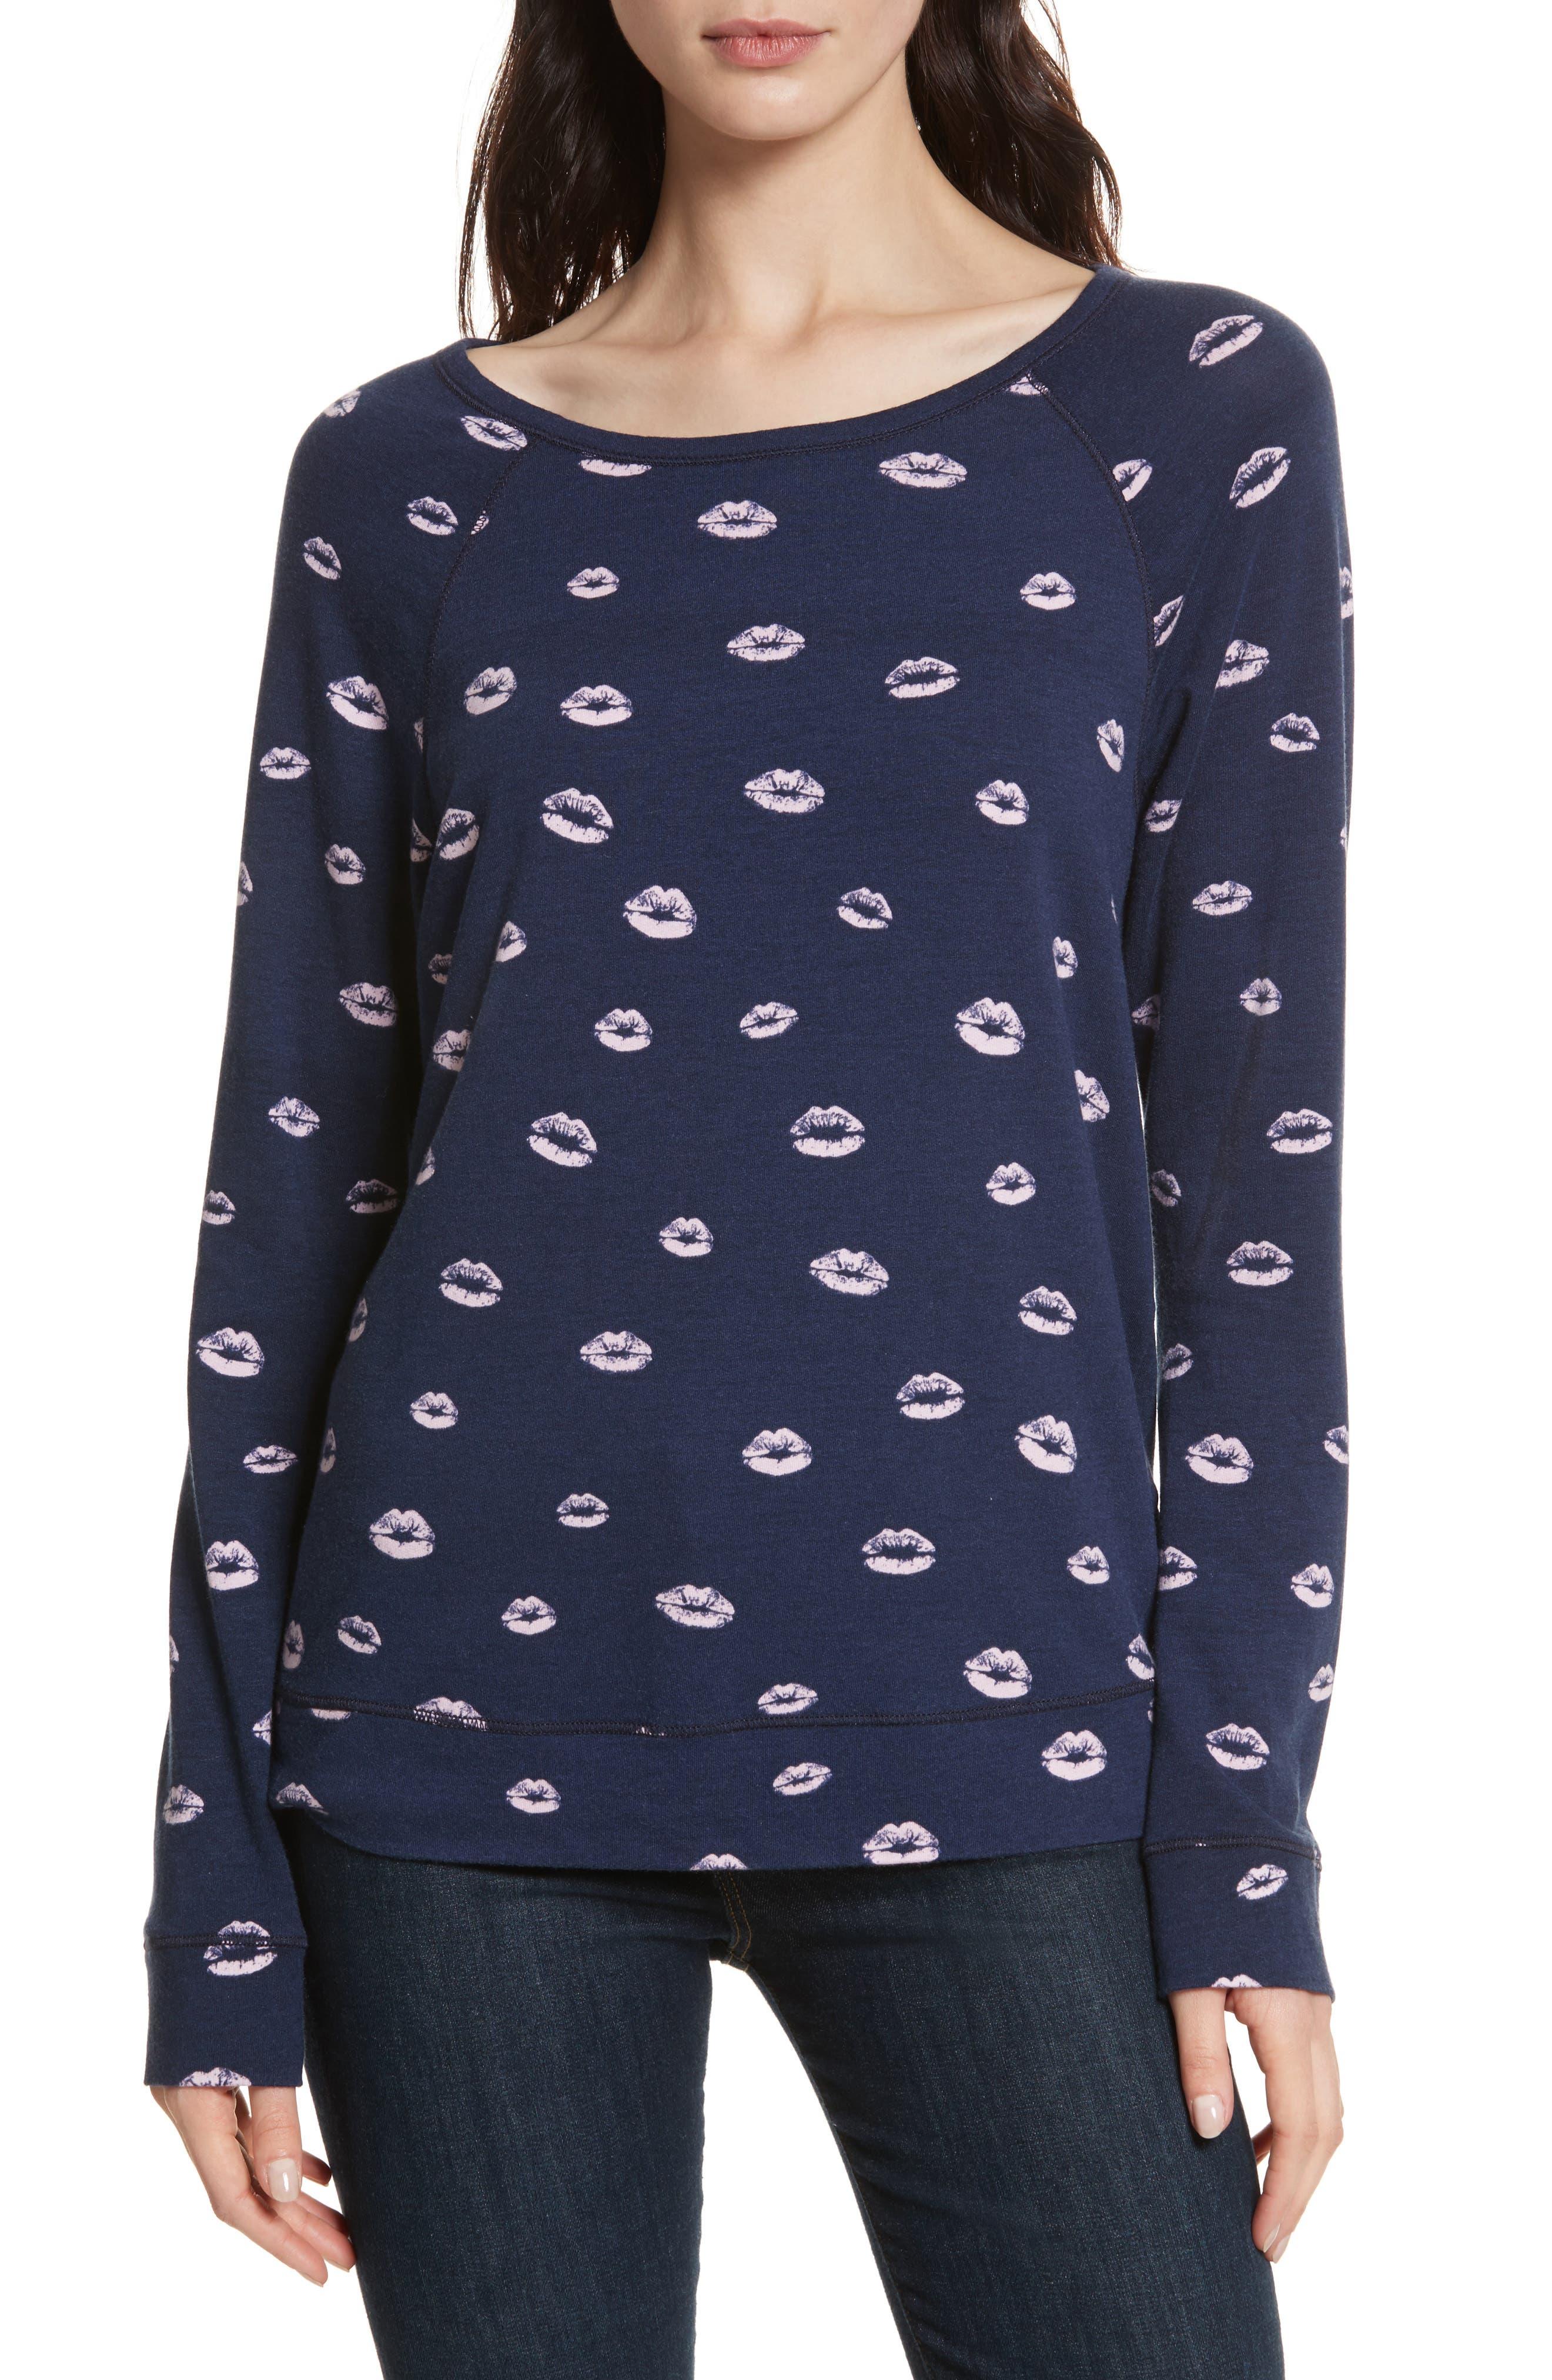 Annora B Kiss Print Sweatshirt,                         Main,                         color, Dark Navy / Arabesque